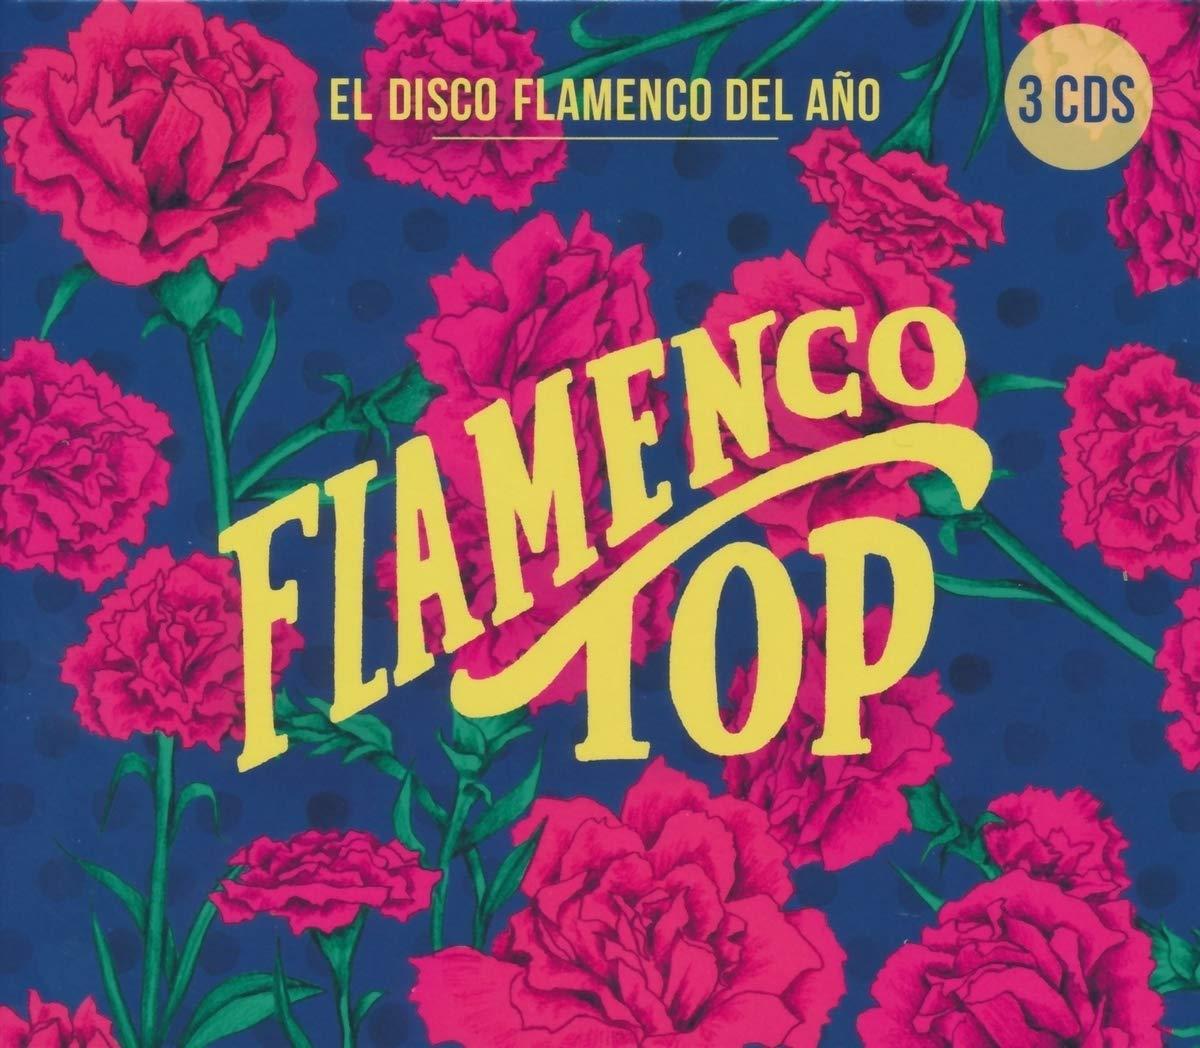 Flamenco Top - El Disco Flamenco (3CD) - Amazon.com Music